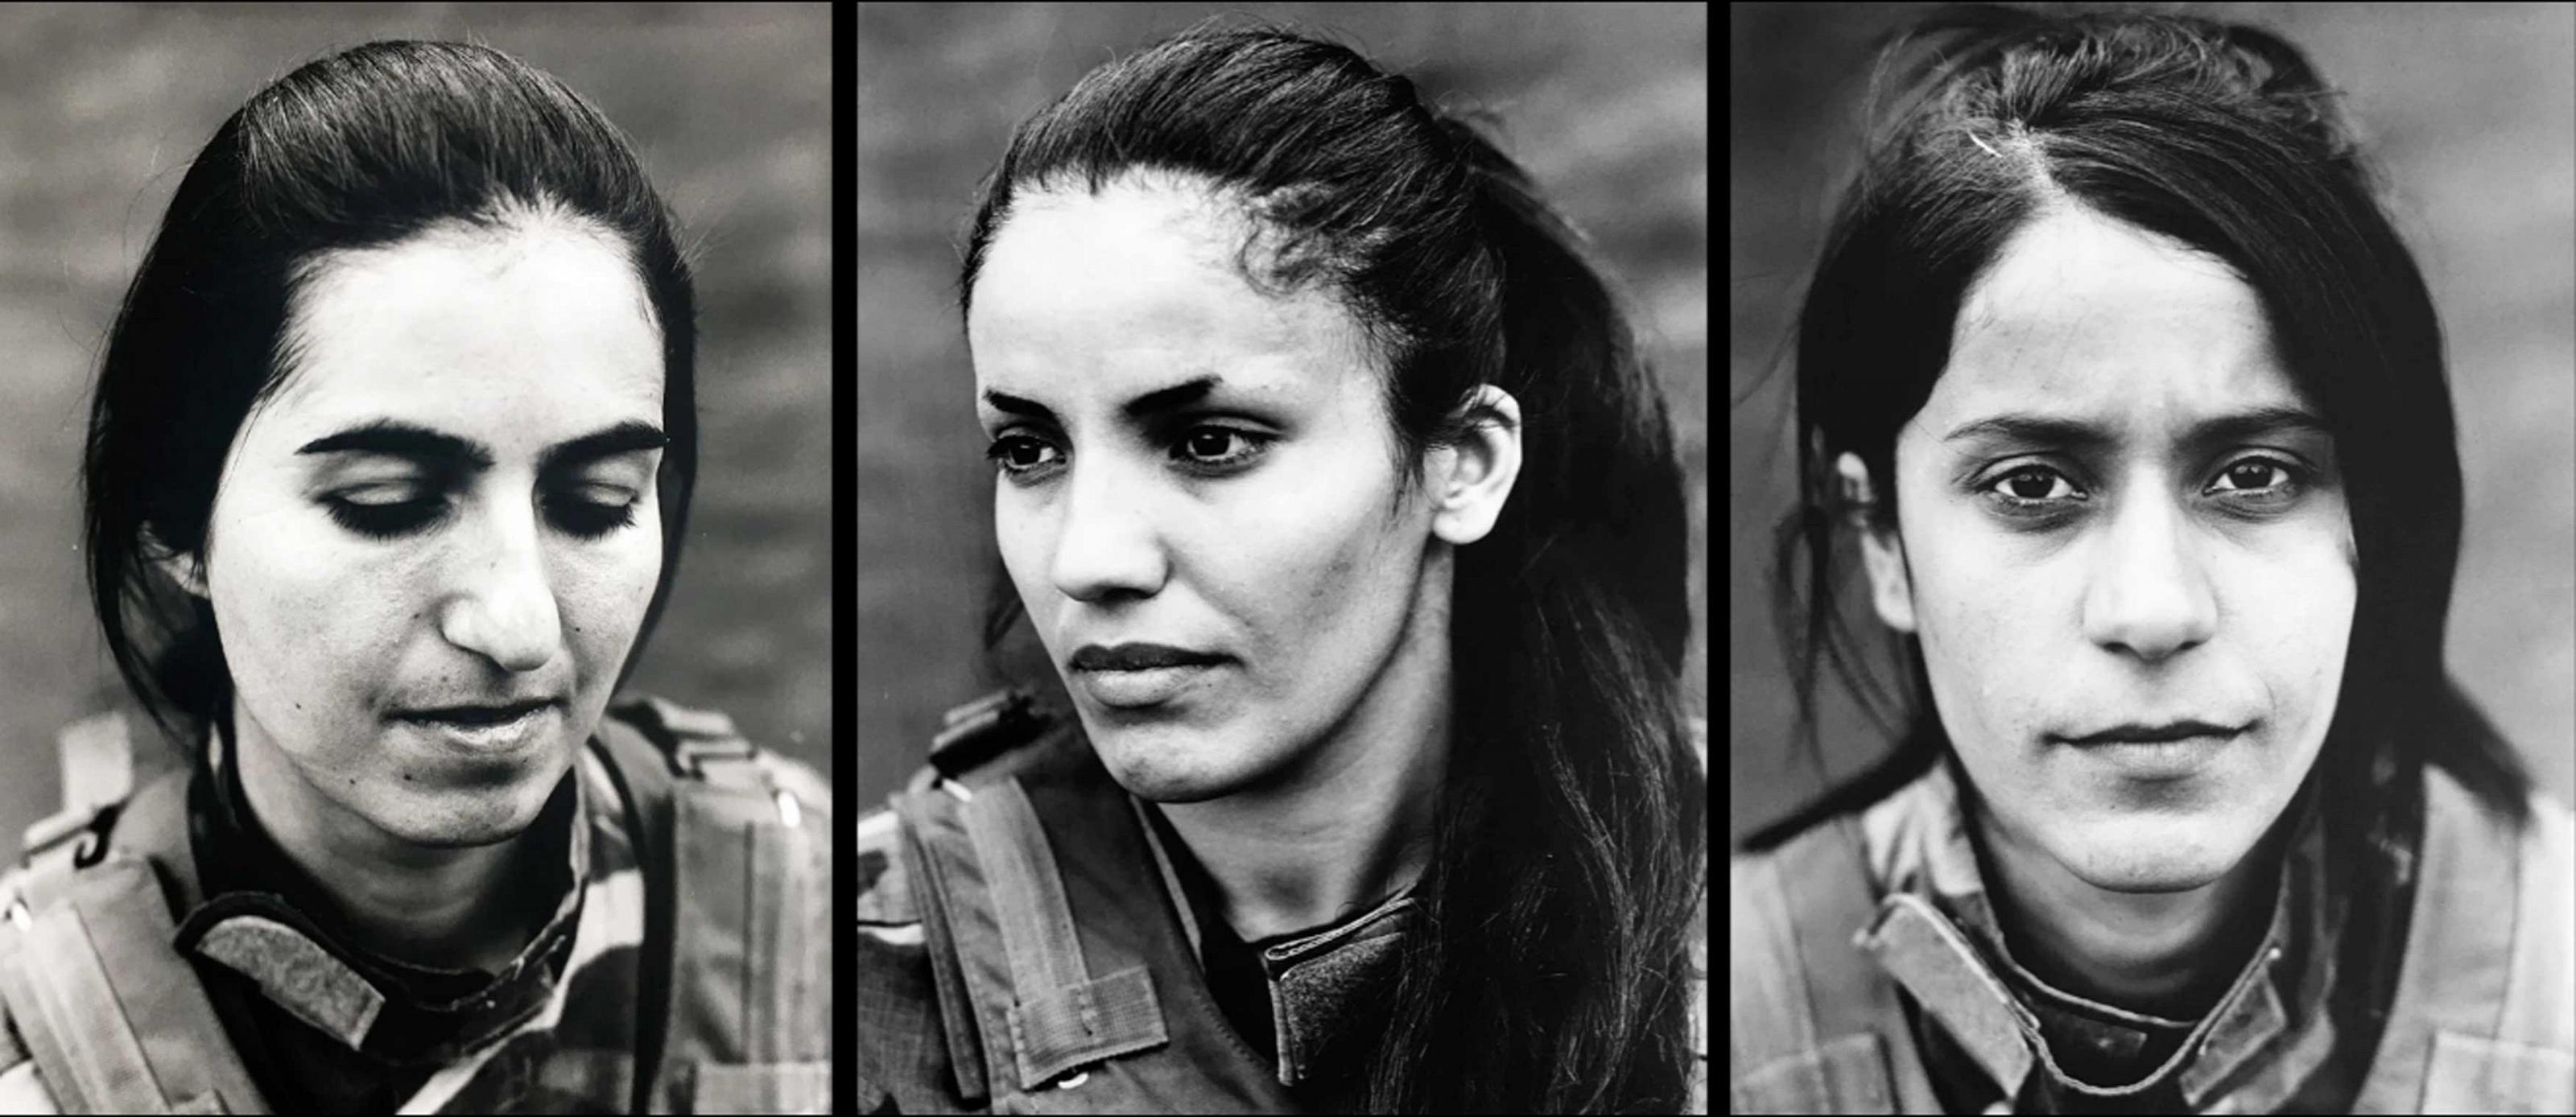 Portraits of Peshmerga women